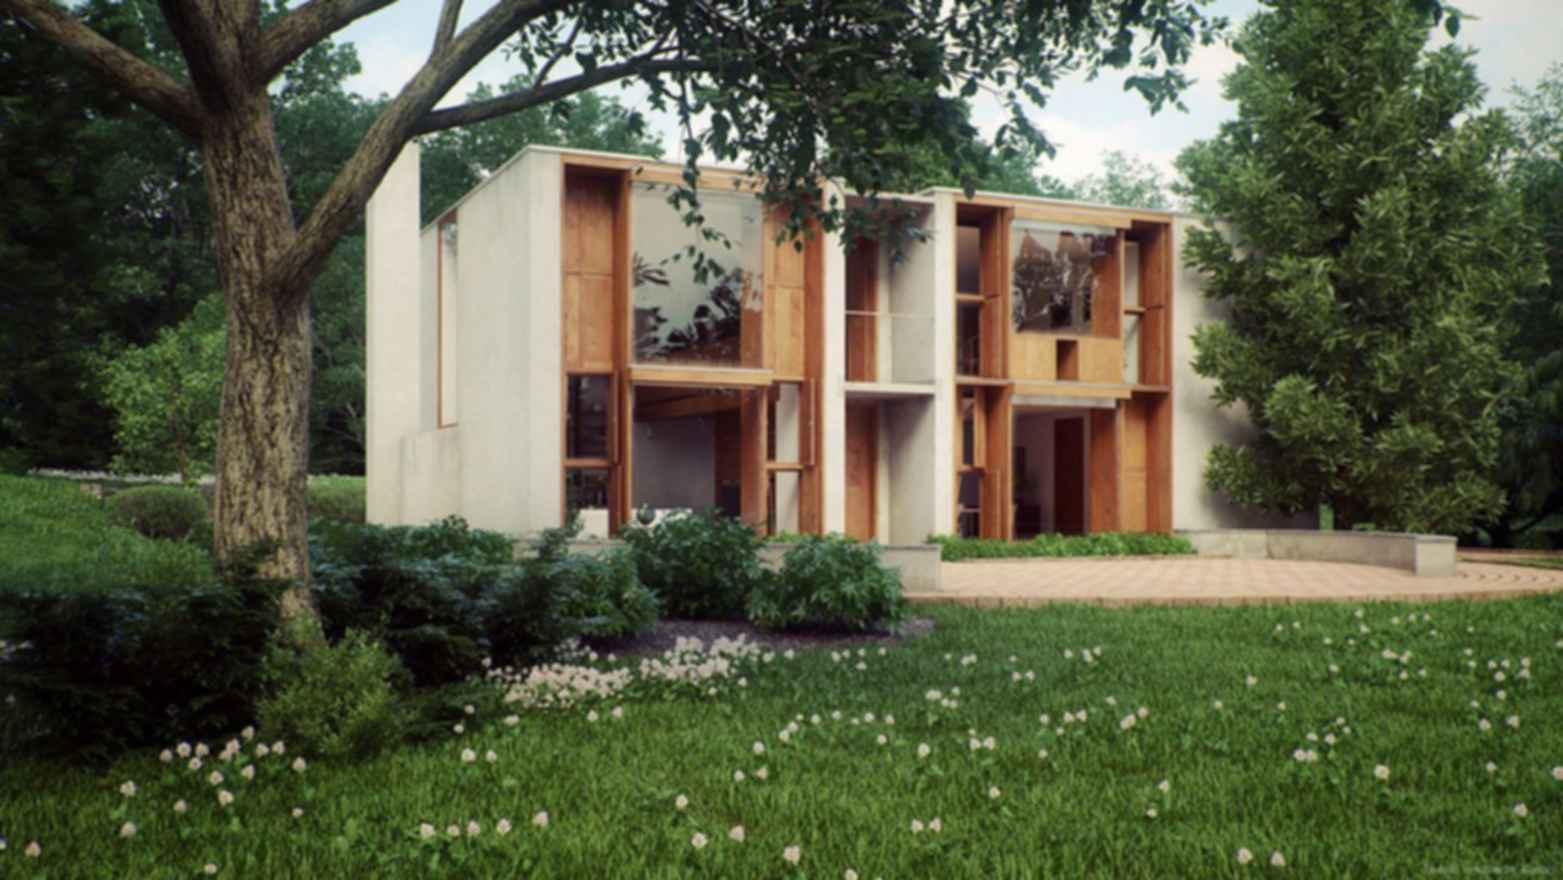 Esherick House - Exterior